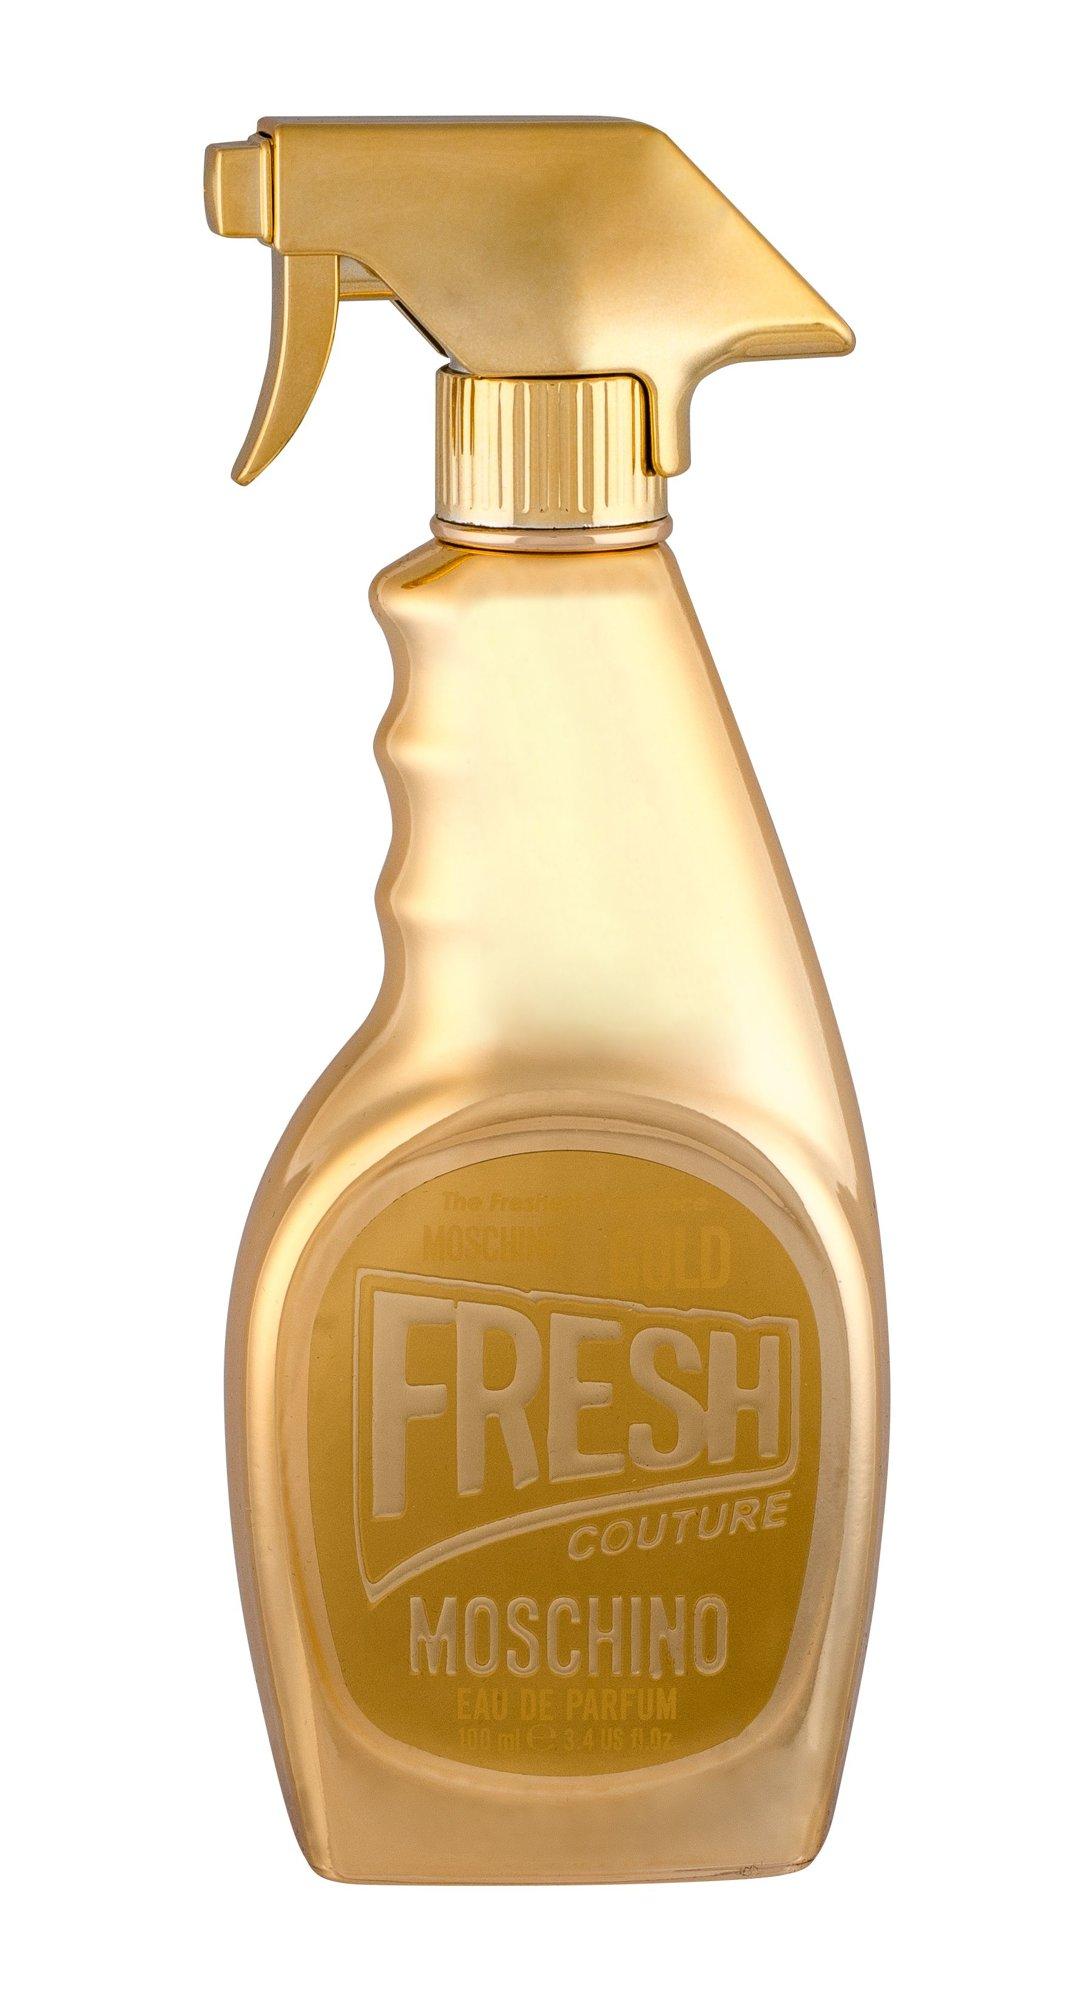 Moschino Fresh Couture Eau de Parfum 100ml